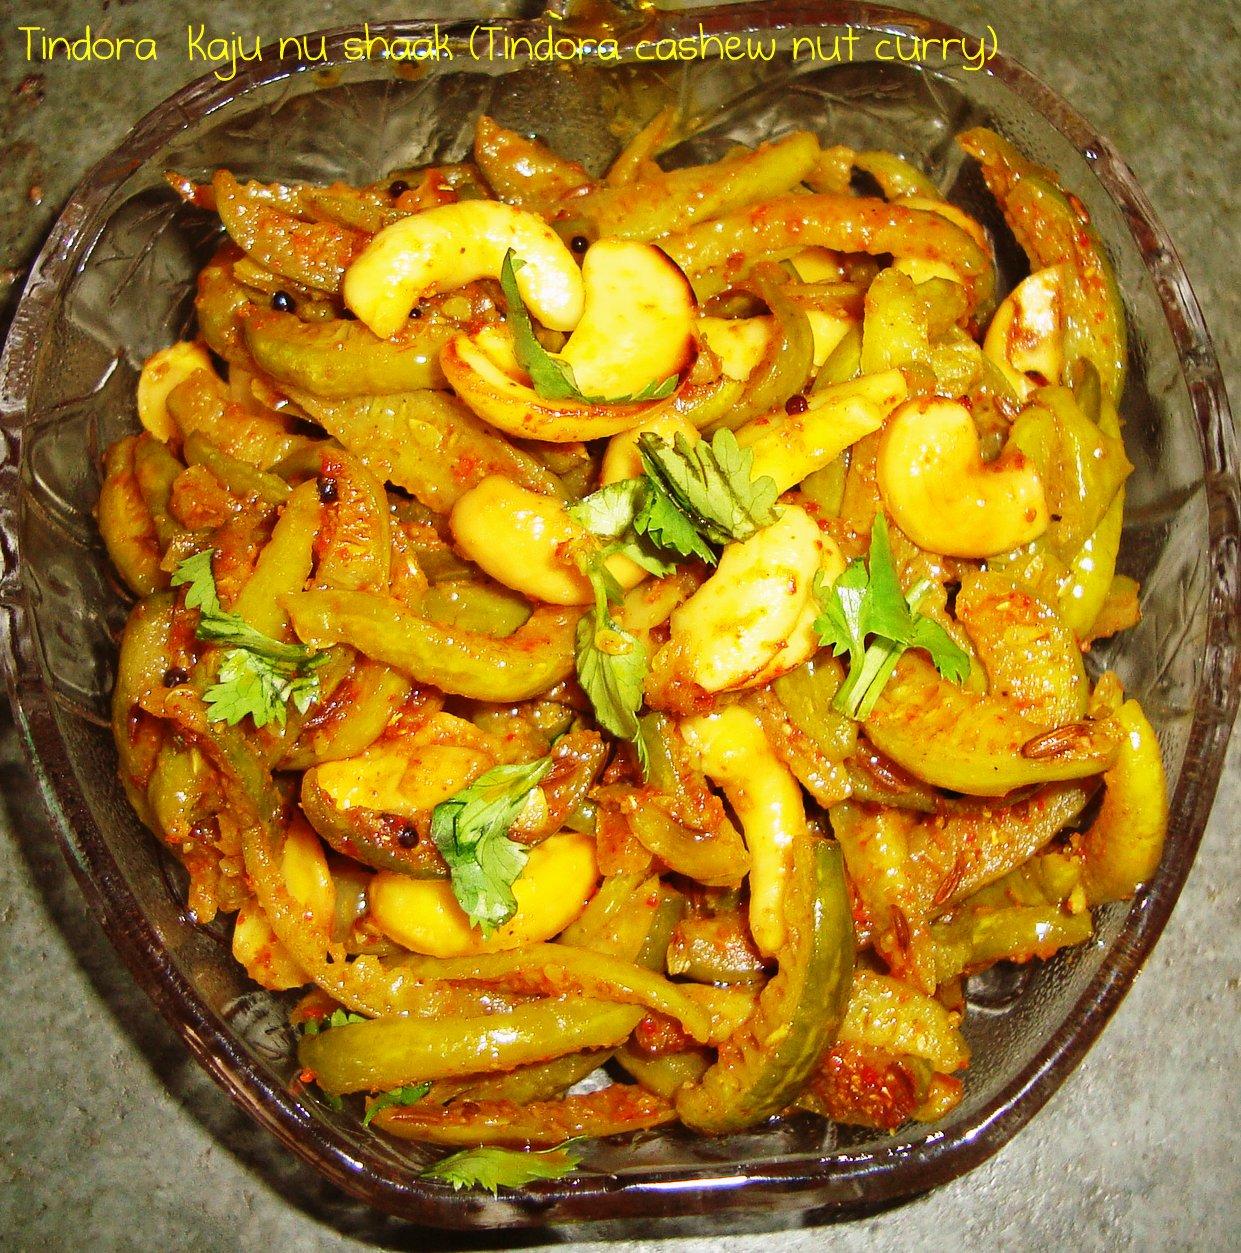 Tindora++Kaju+nu+shaak+%28Tindora+cashew+nut+curry%29.JPG